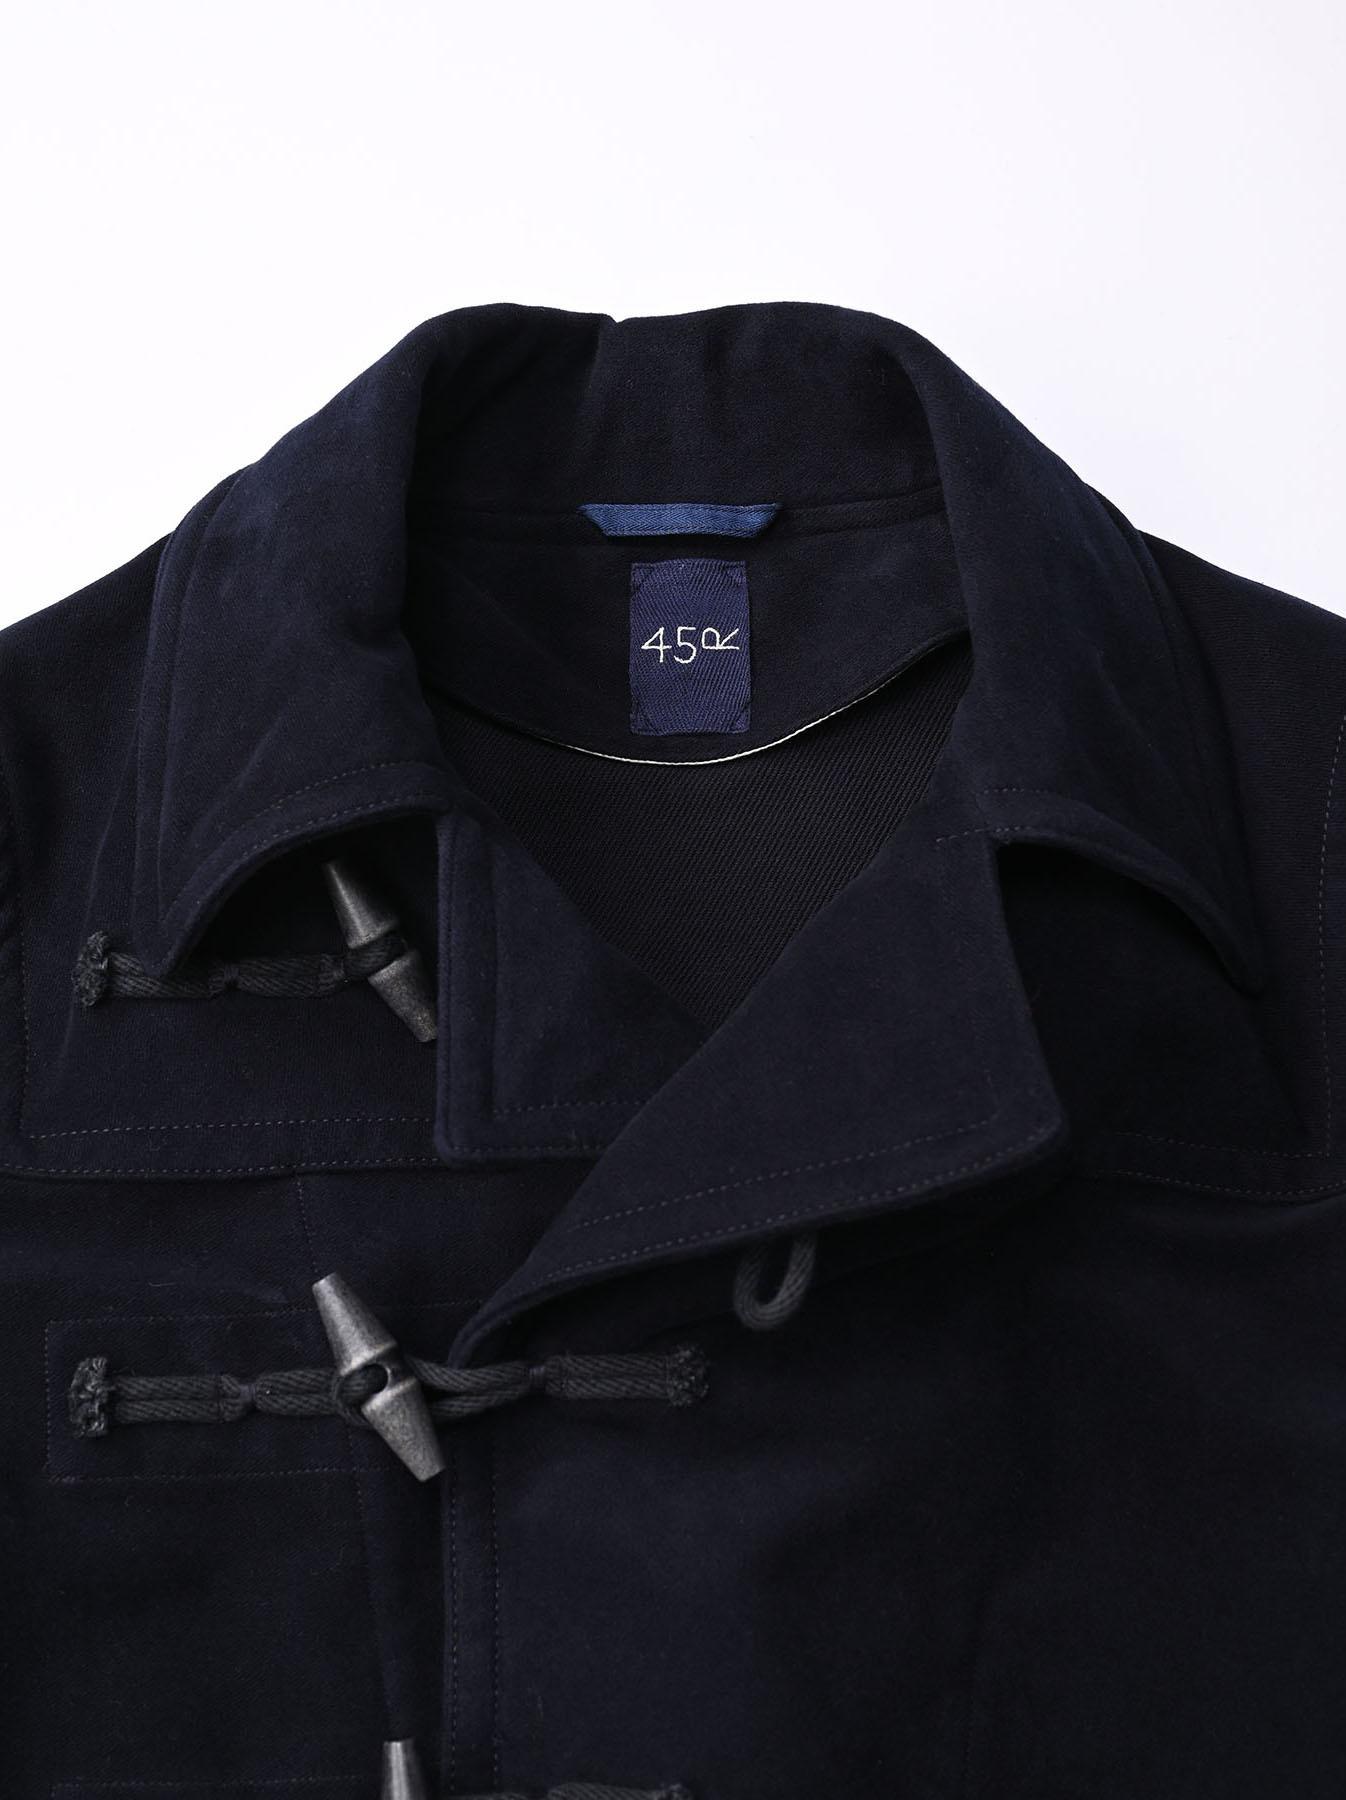 Thick Cotton Flannel Hayama Duffle Coat-4